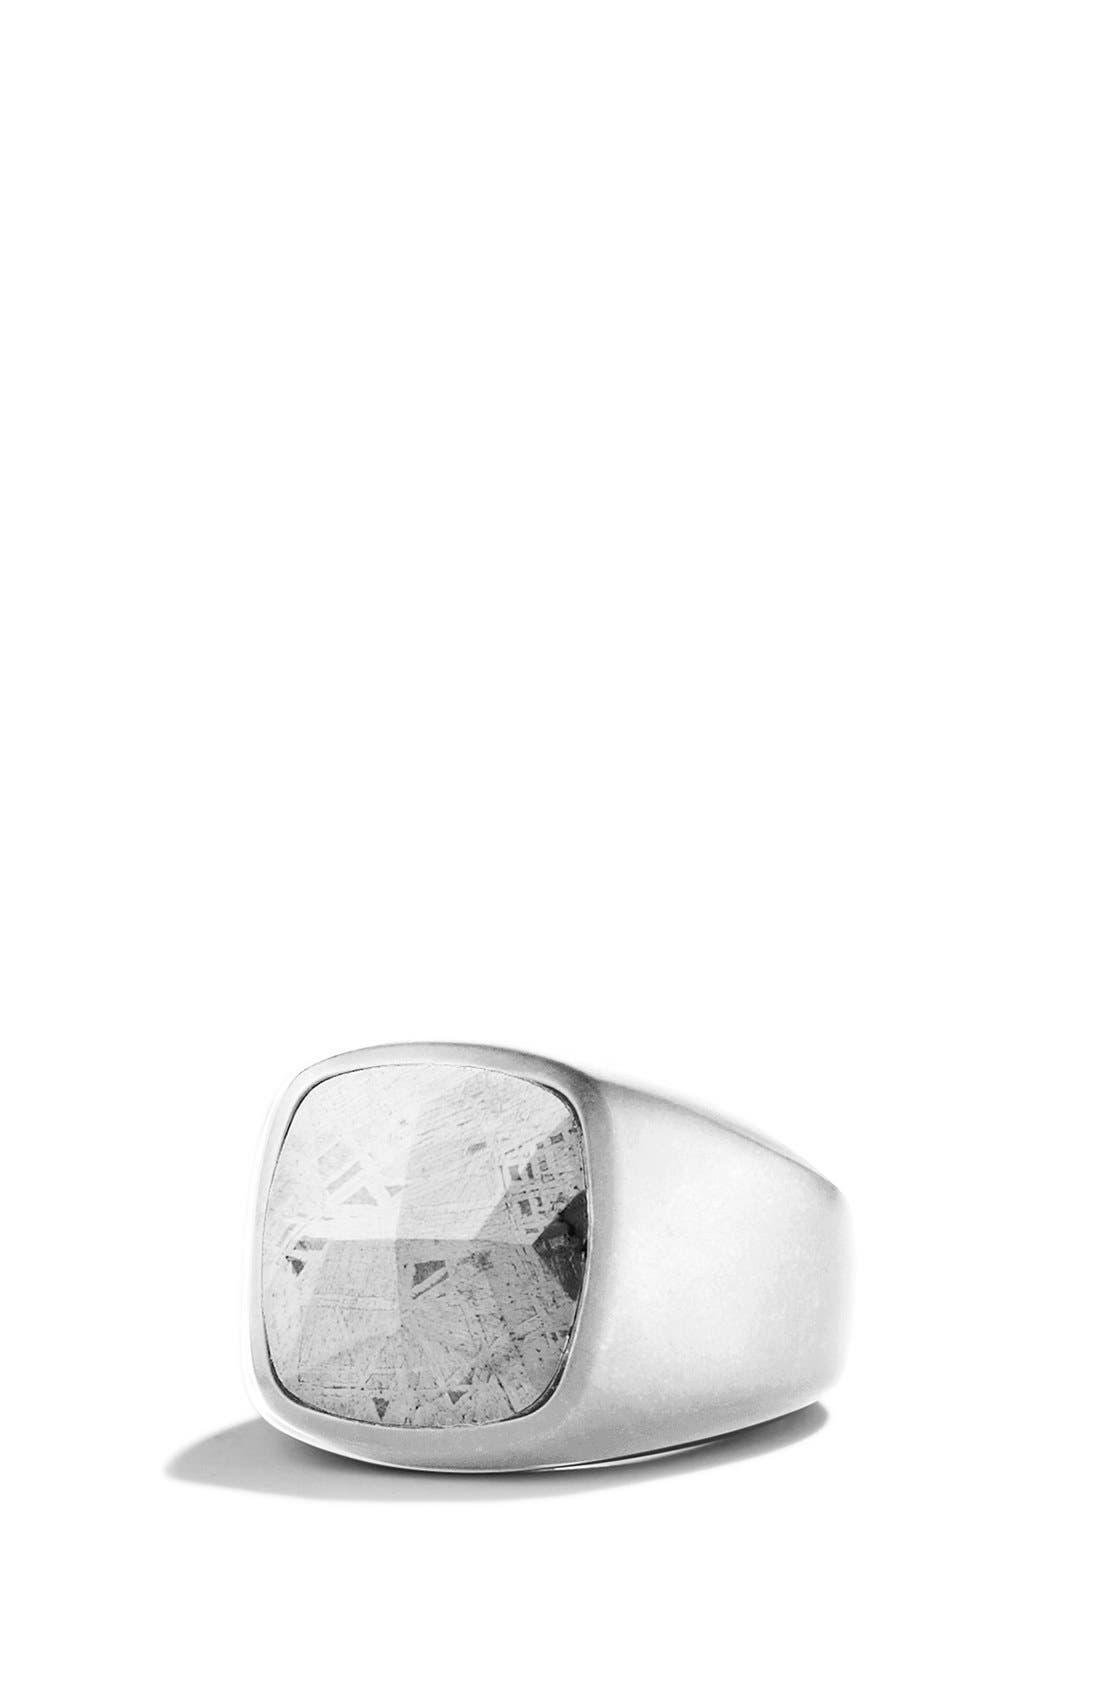 Signet Ring with Meteorite,                         Main,                         color, Meteorite